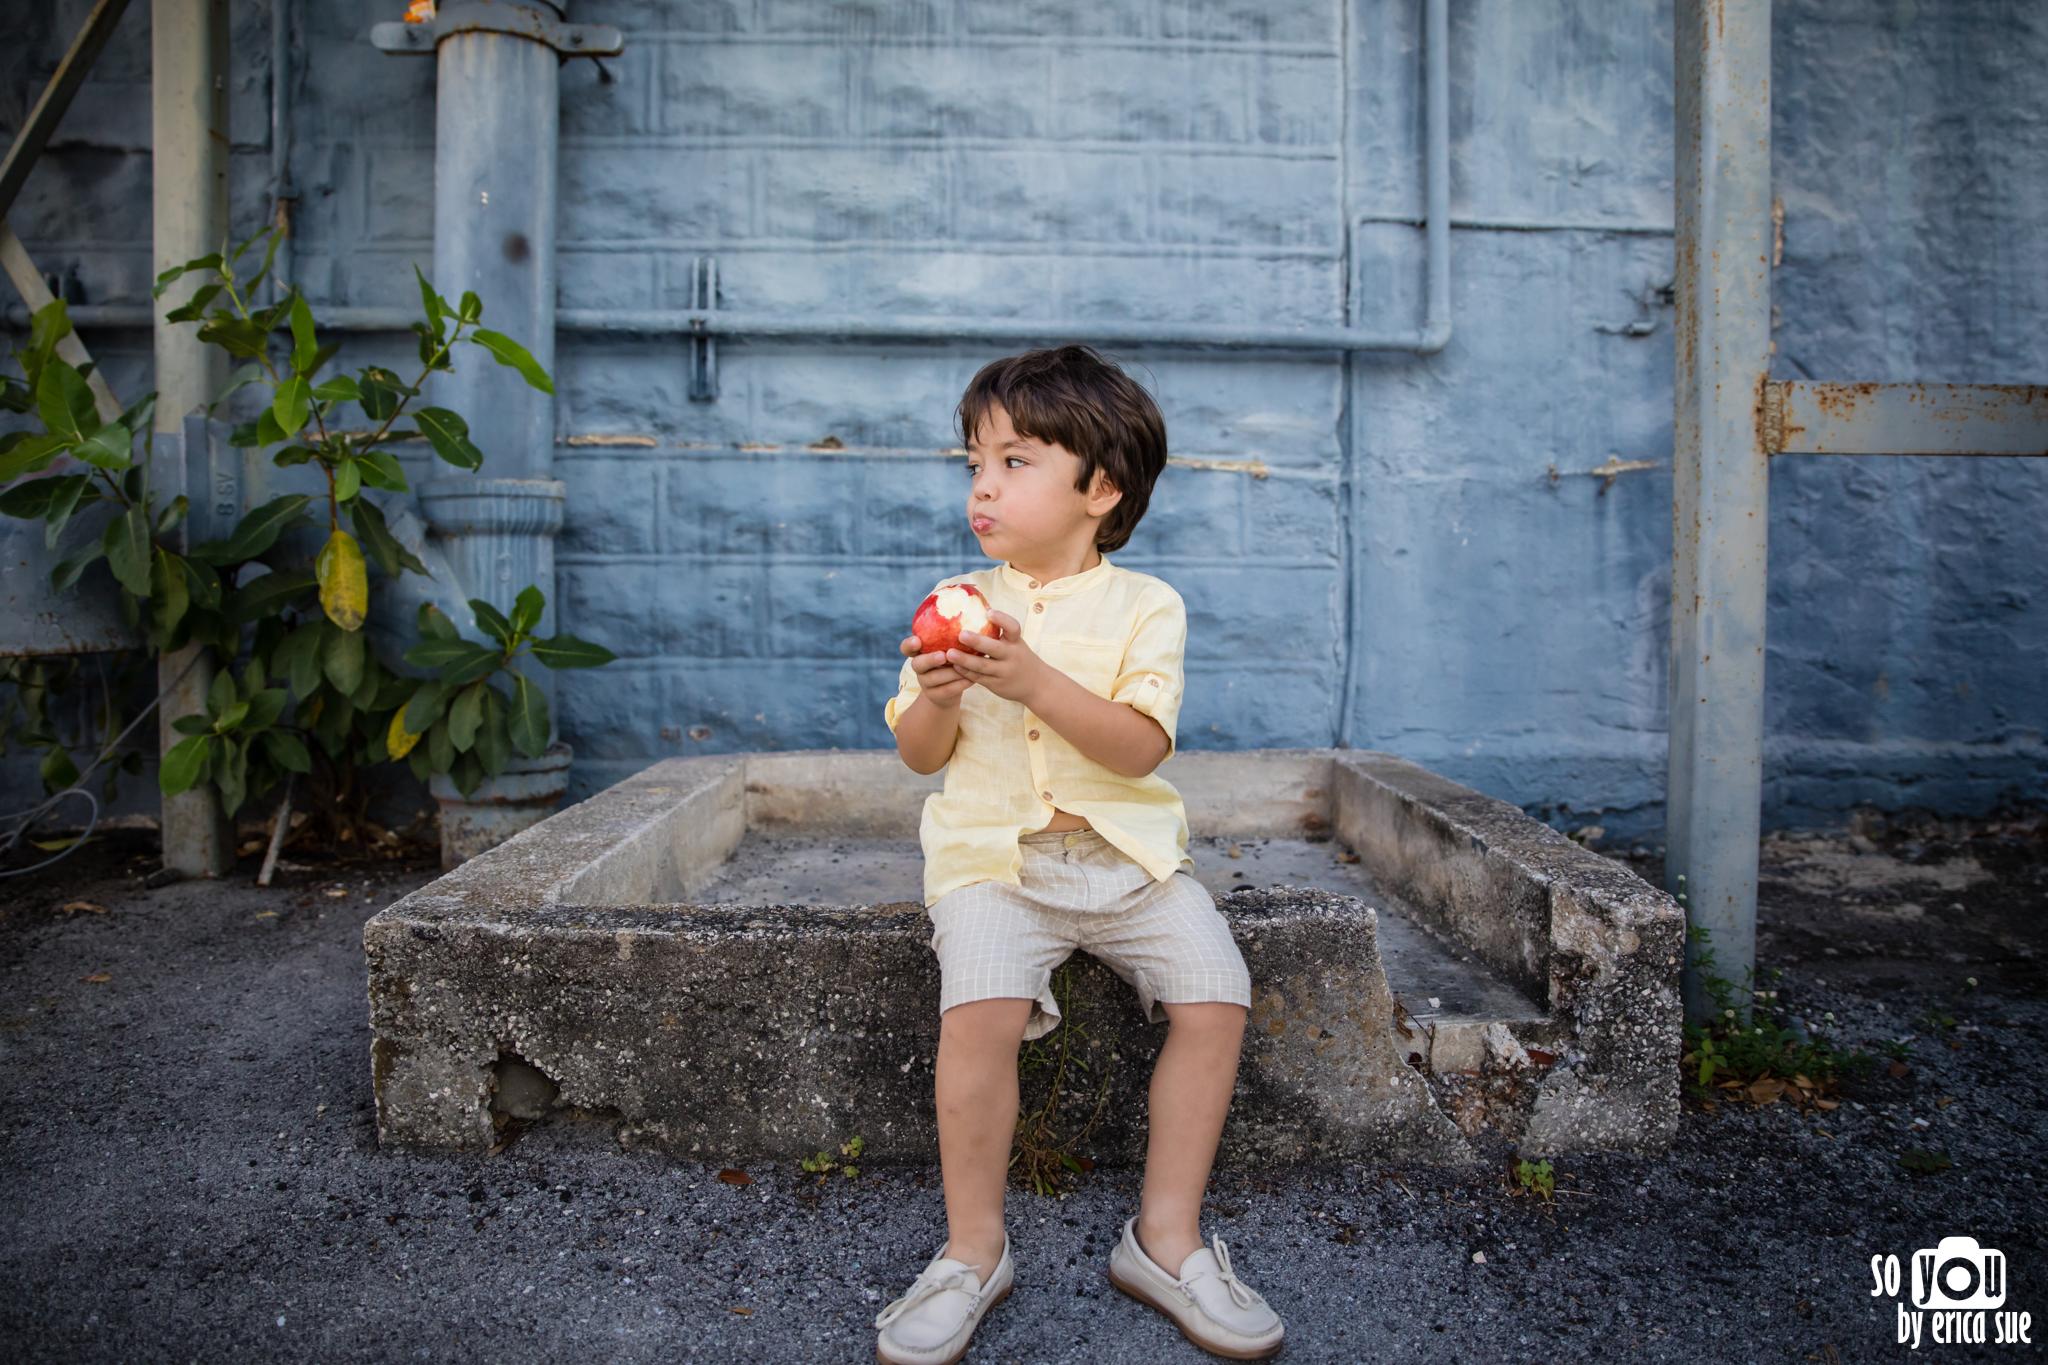 coconut-grove-lifestyle-family-photography-8630.jpg